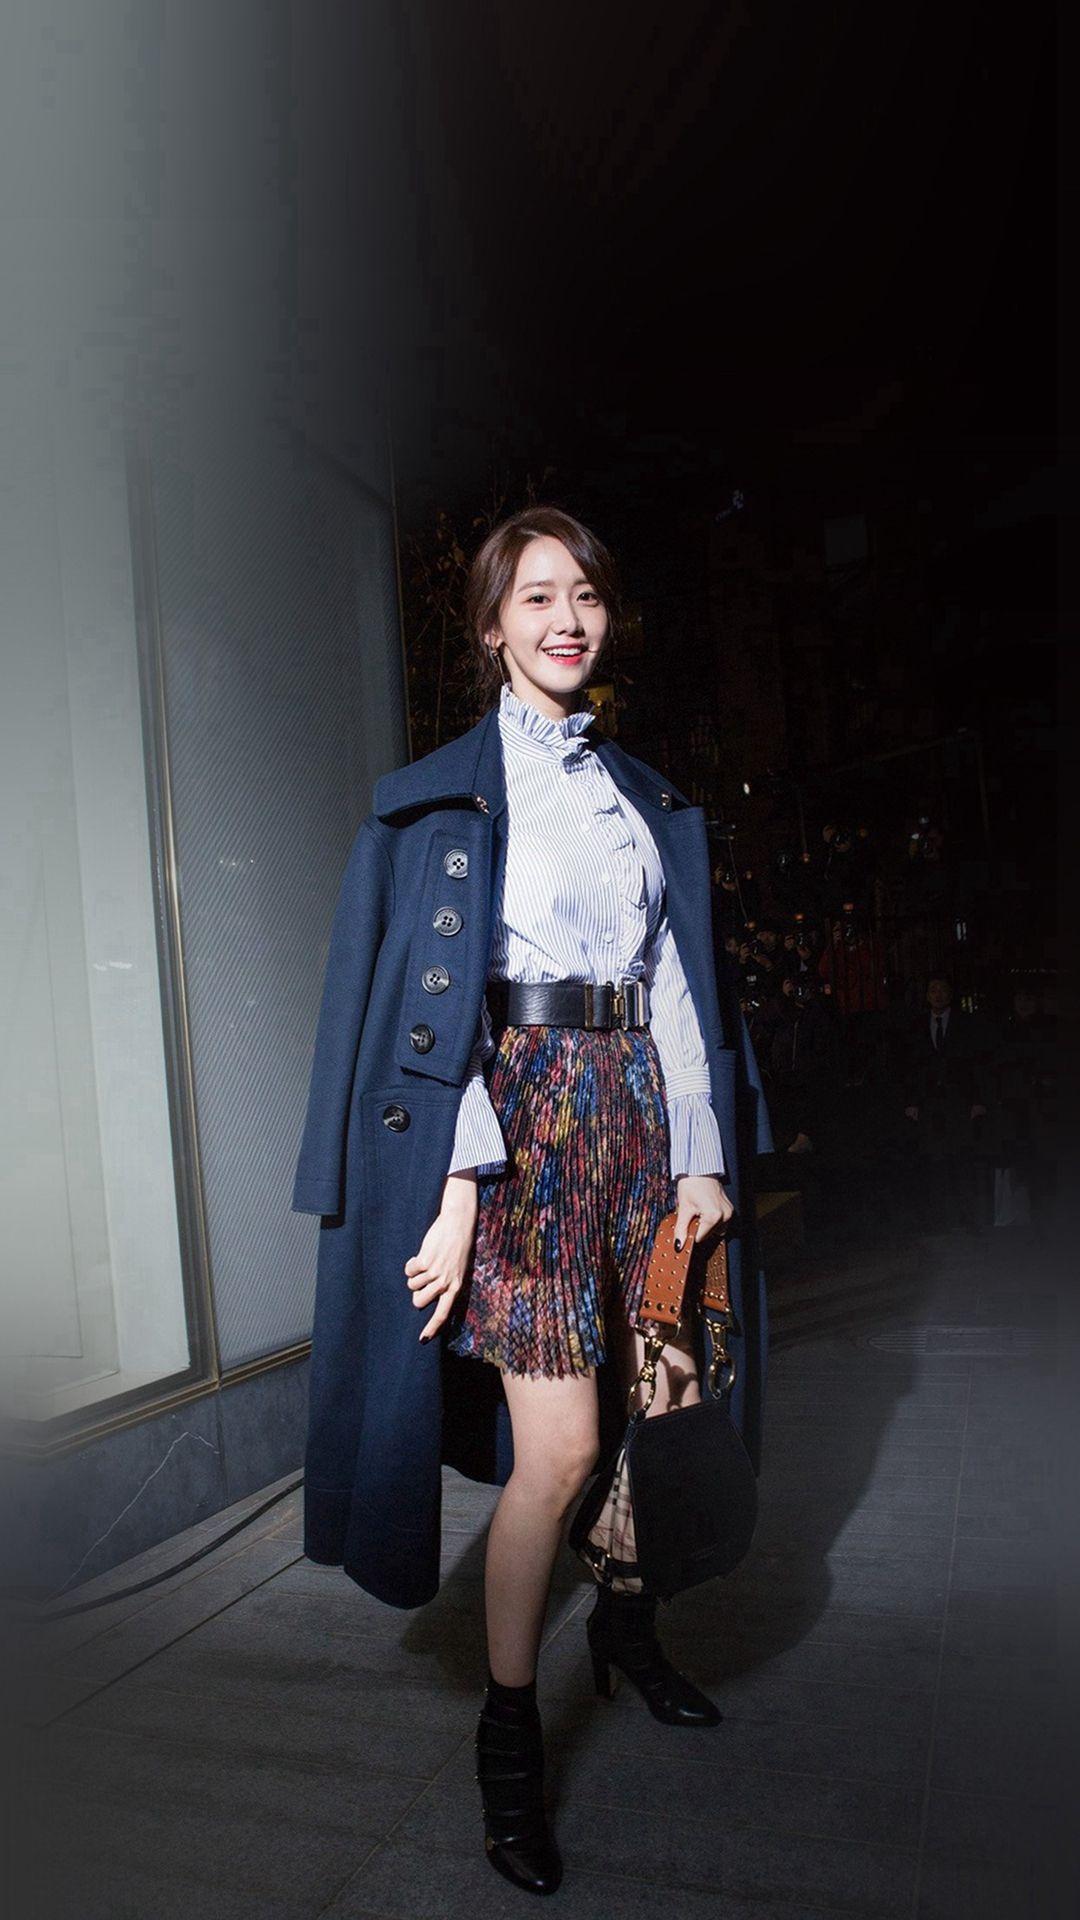 Kpop Snsd Yoona Smile Iphone 8 Wallpapers